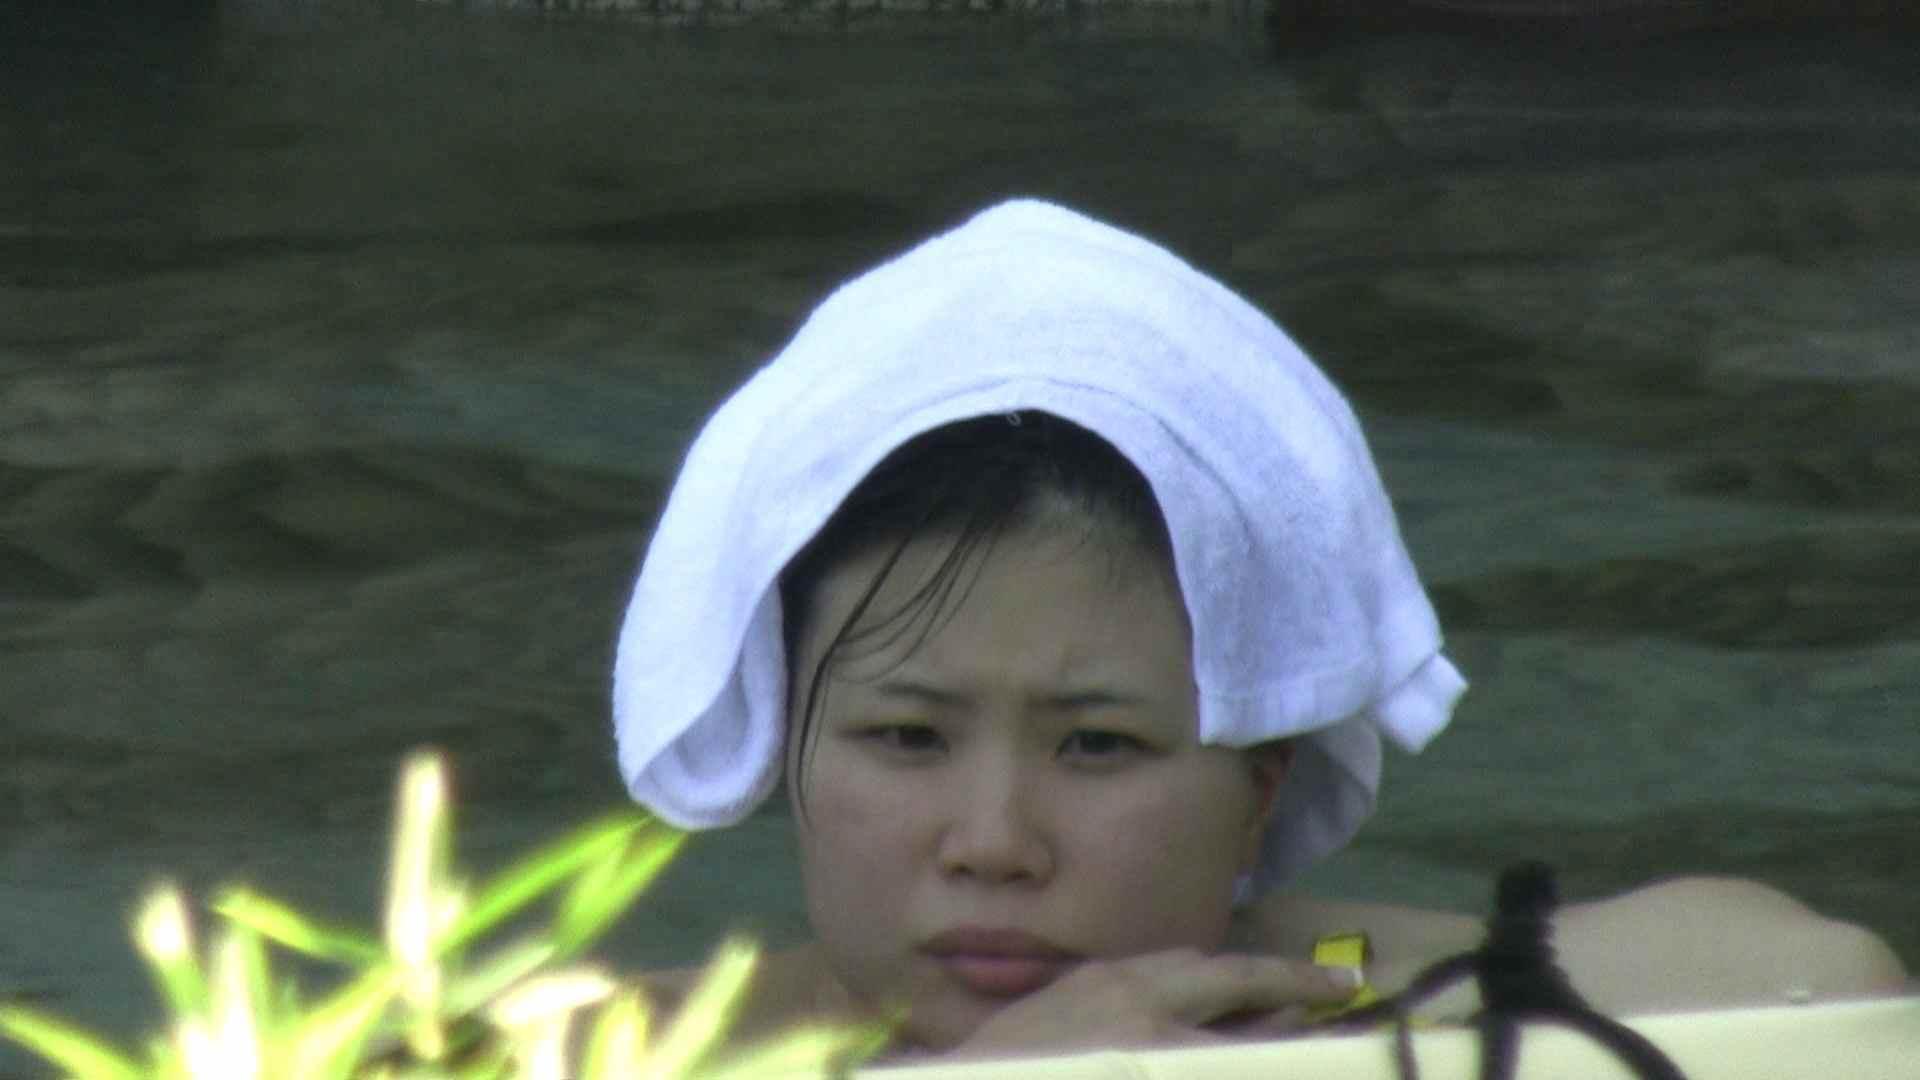 Aquaな露天風呂Vol.183 露天風呂編 | 盗撮シリーズ  104PIX 53